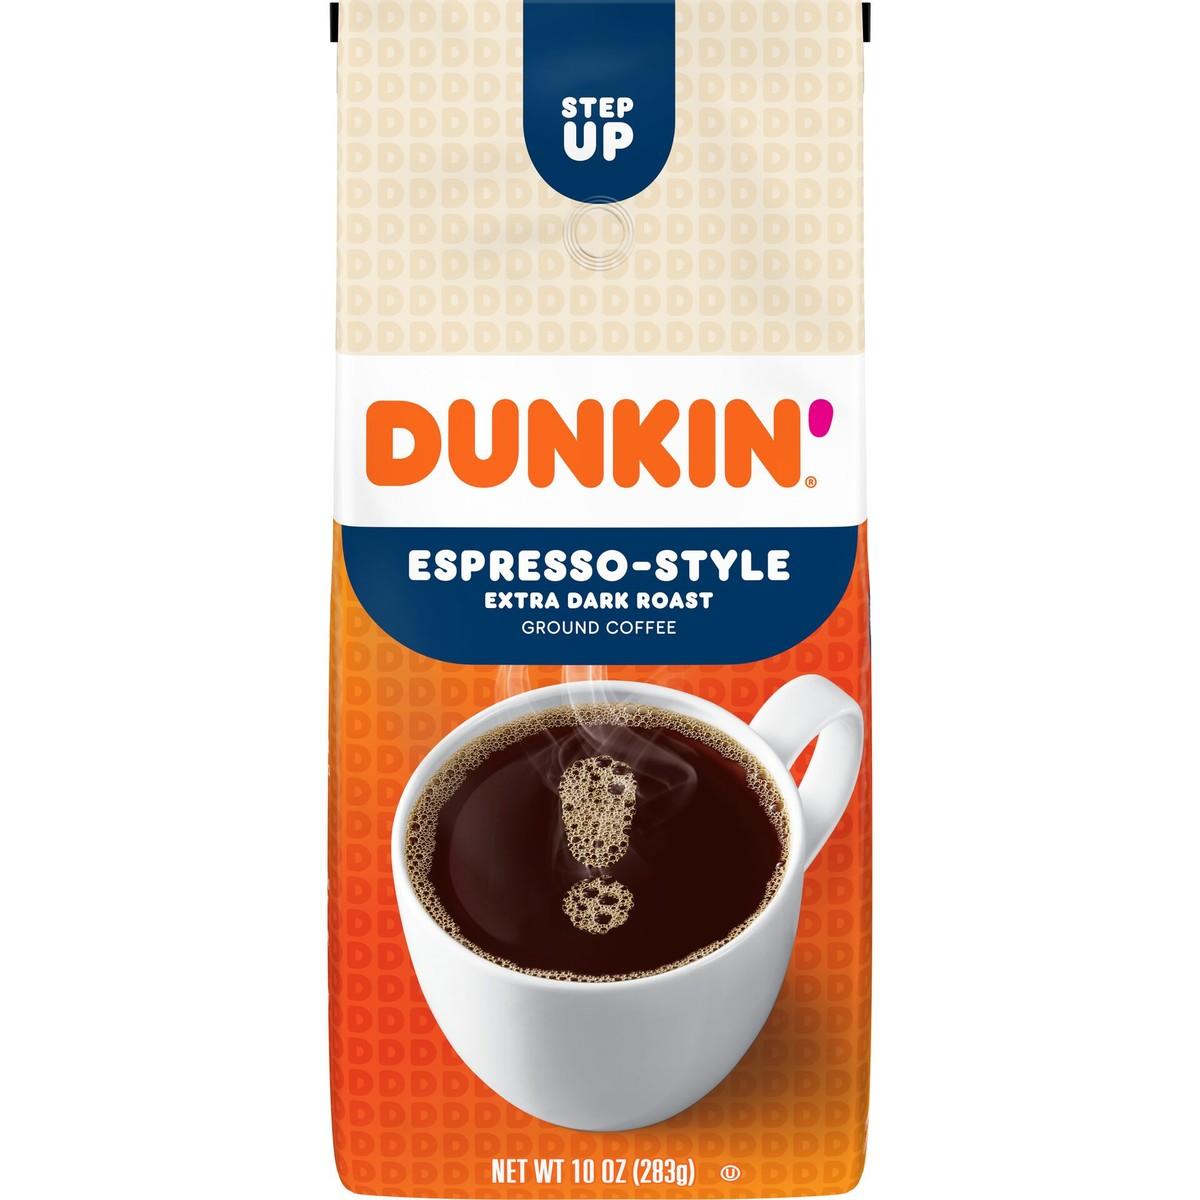 Espresso-Style Extra Dark Roast Coffee